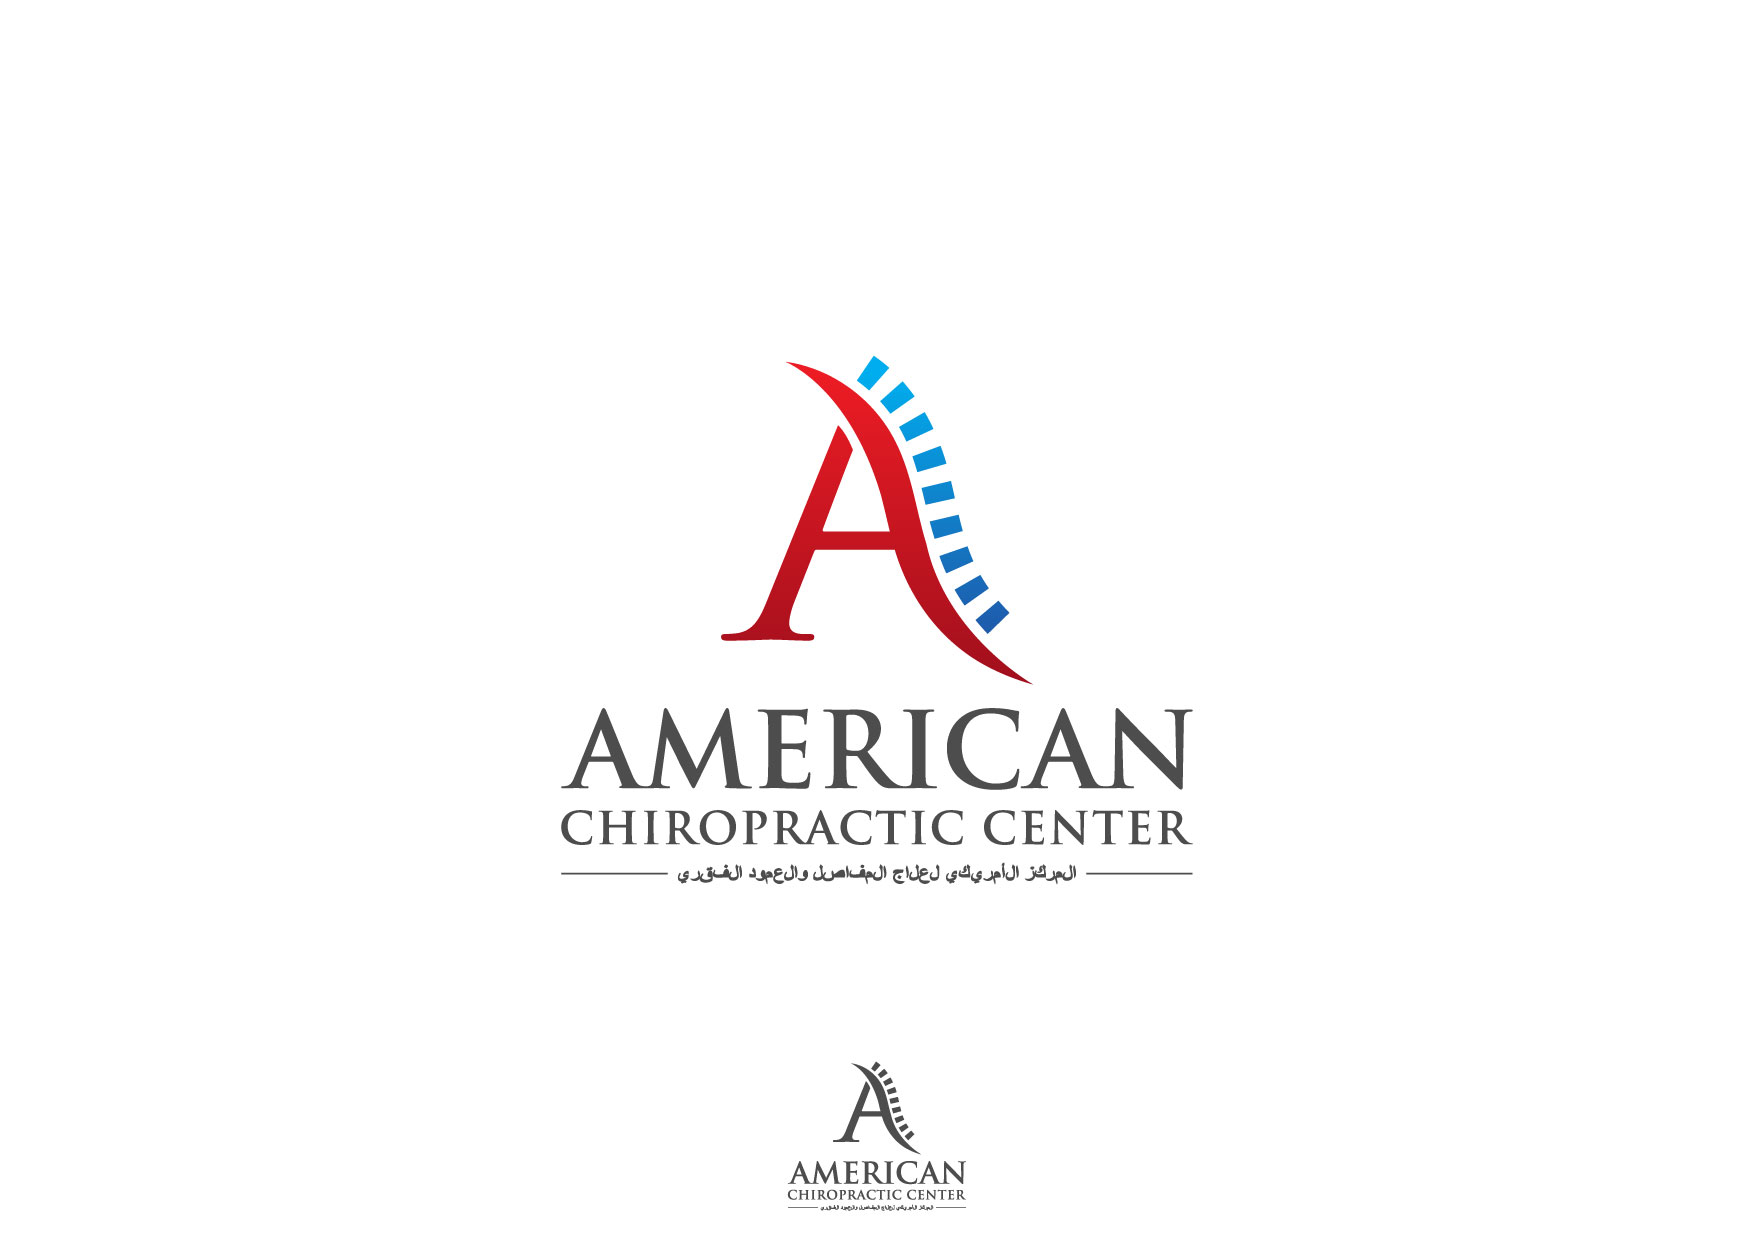 Logo Design by Nurgalih Destianto - Entry No. 51 in the Logo Design Contest Logo Design for American Chiropractic Center.